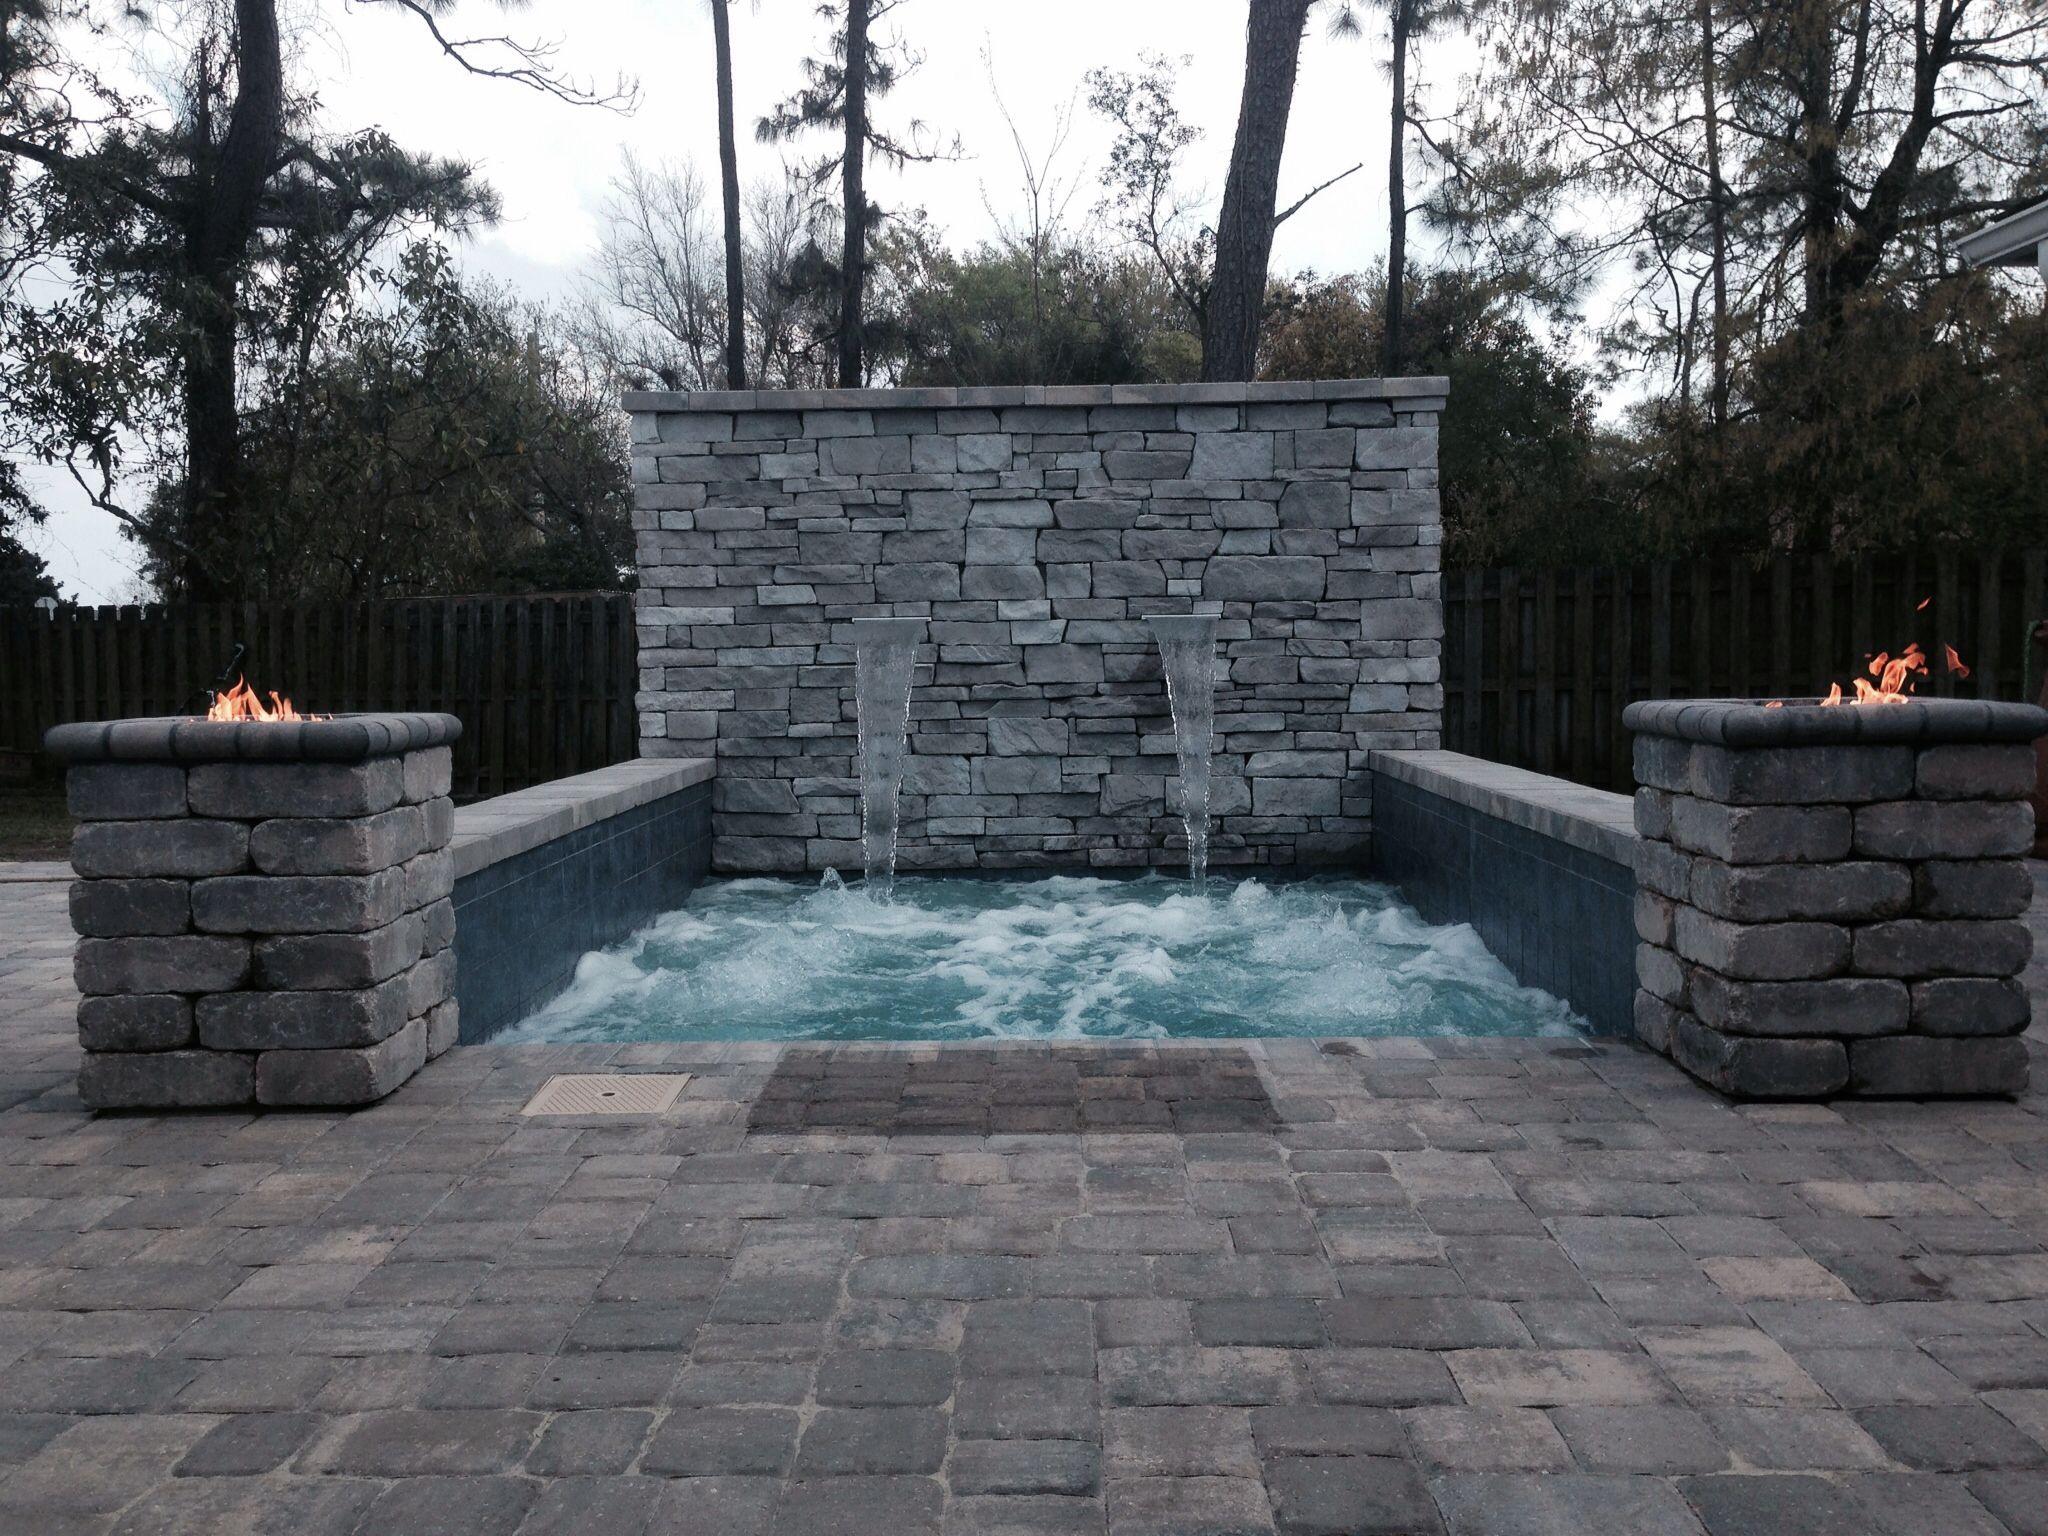 Jacksonville fl in addition fiberglass pools jacksonville fl on home - Cocktail Pool Built By My Ty Design Jacksonville Fl